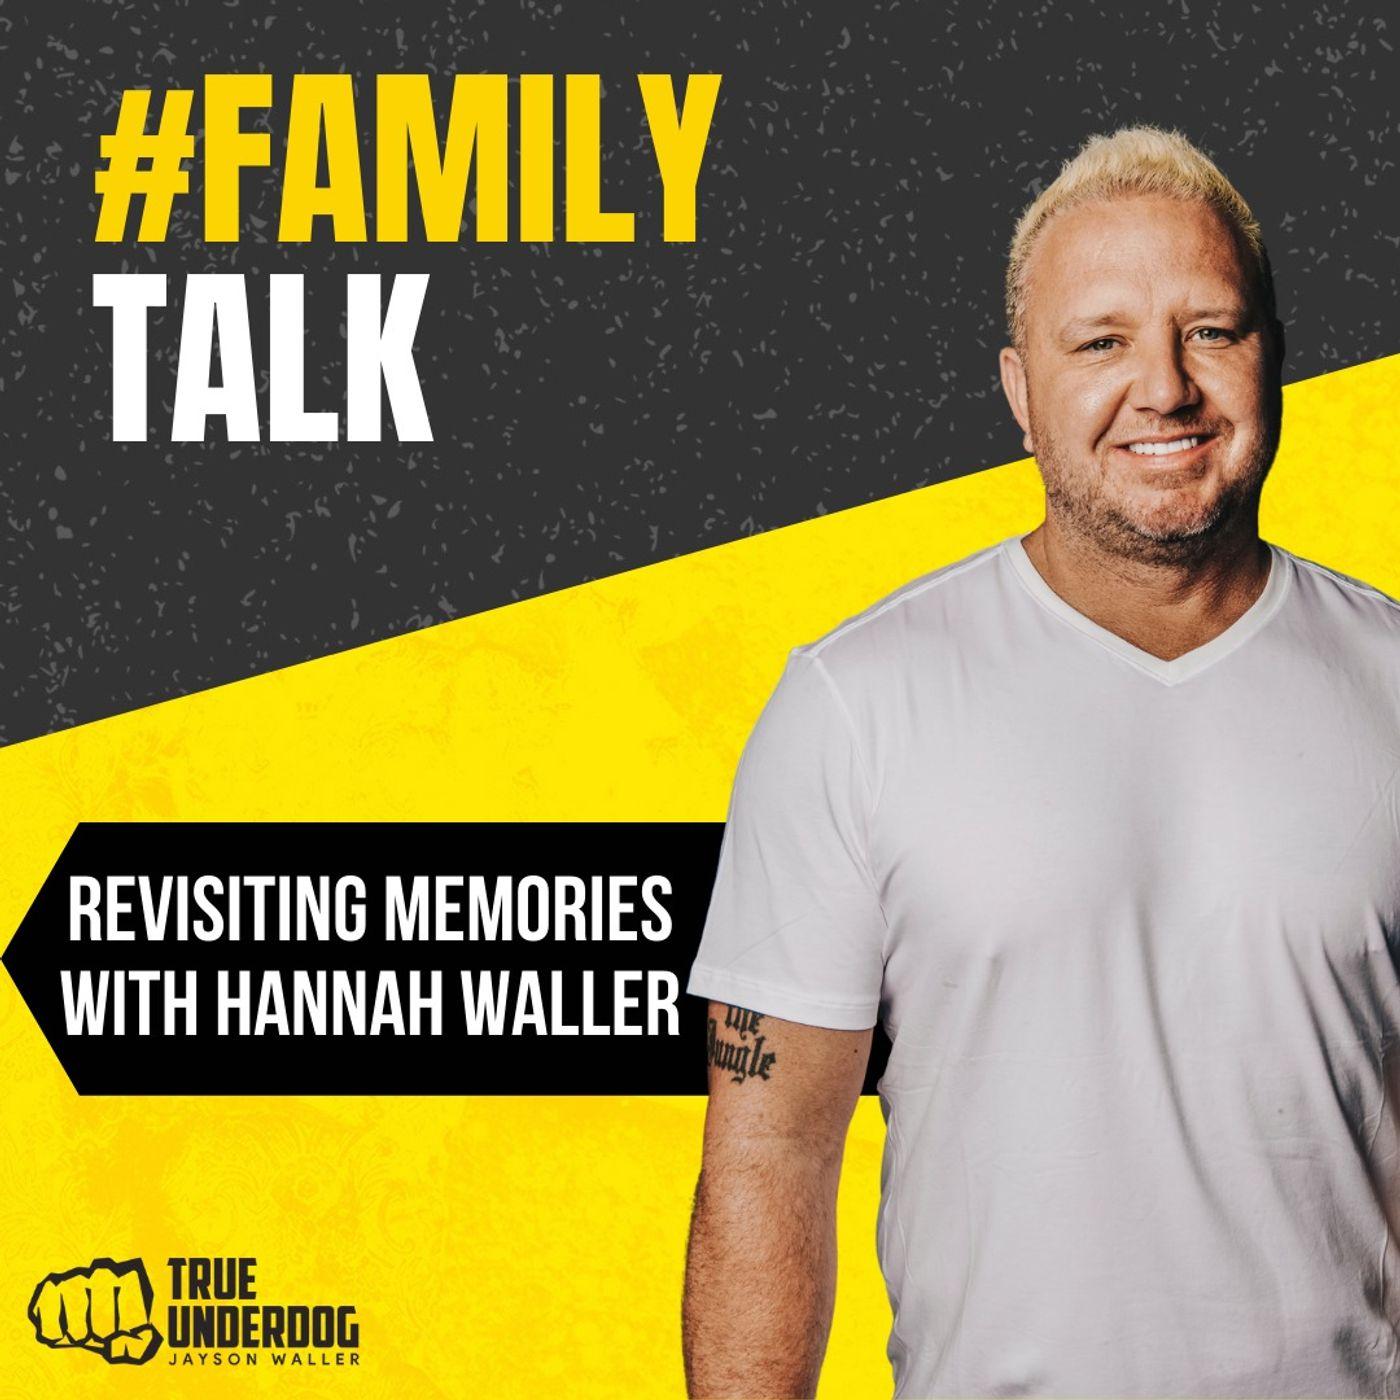 #FamilyTalk: Revisiting Memories with Hannah Waller